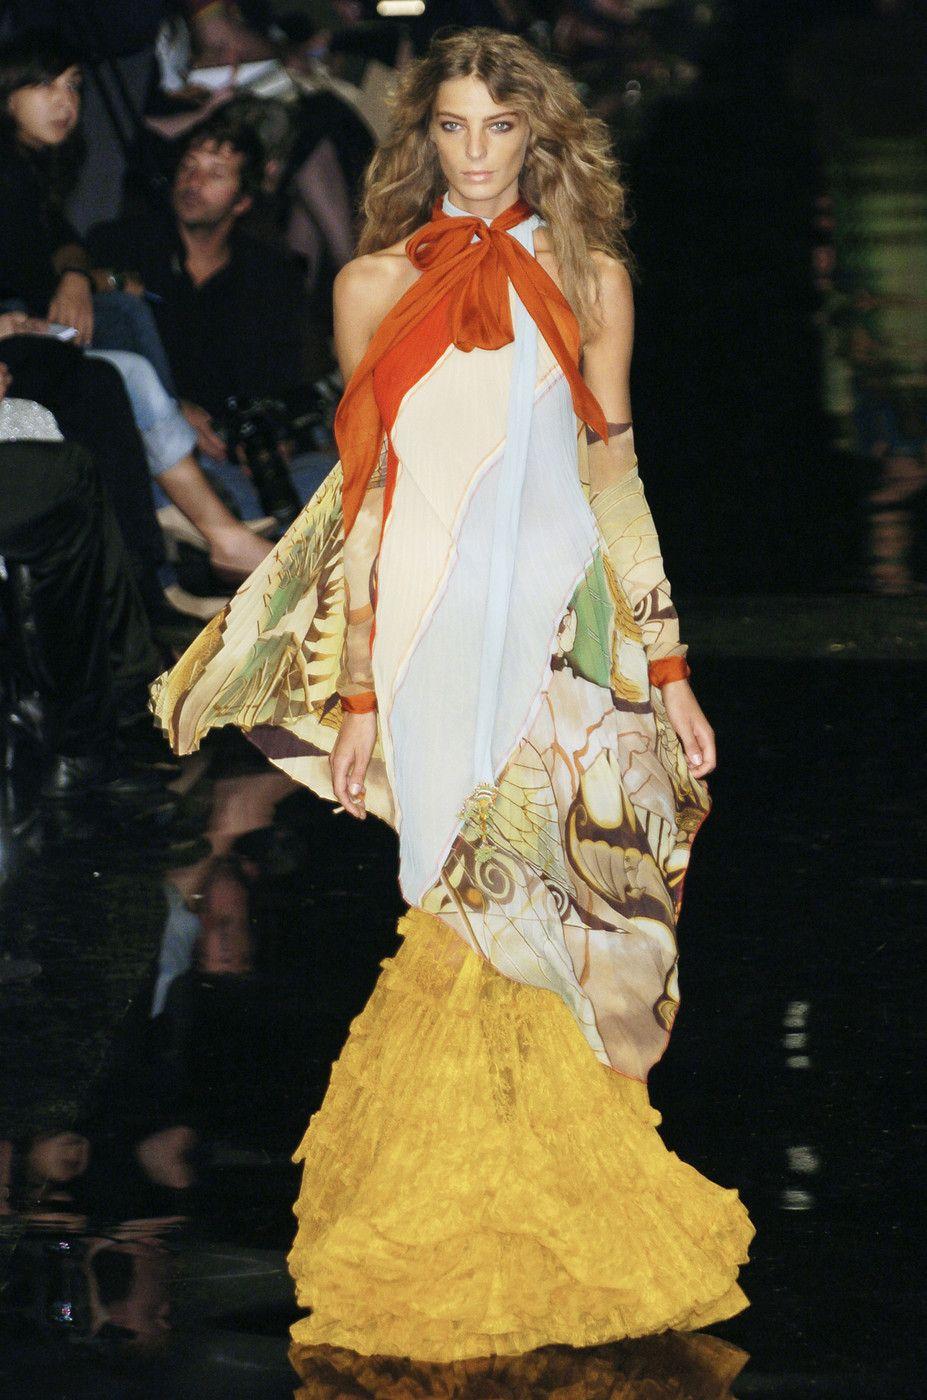 Jean Paul Gaultier Spring/Summer 2005 - Paris Model: Daria Werbowy